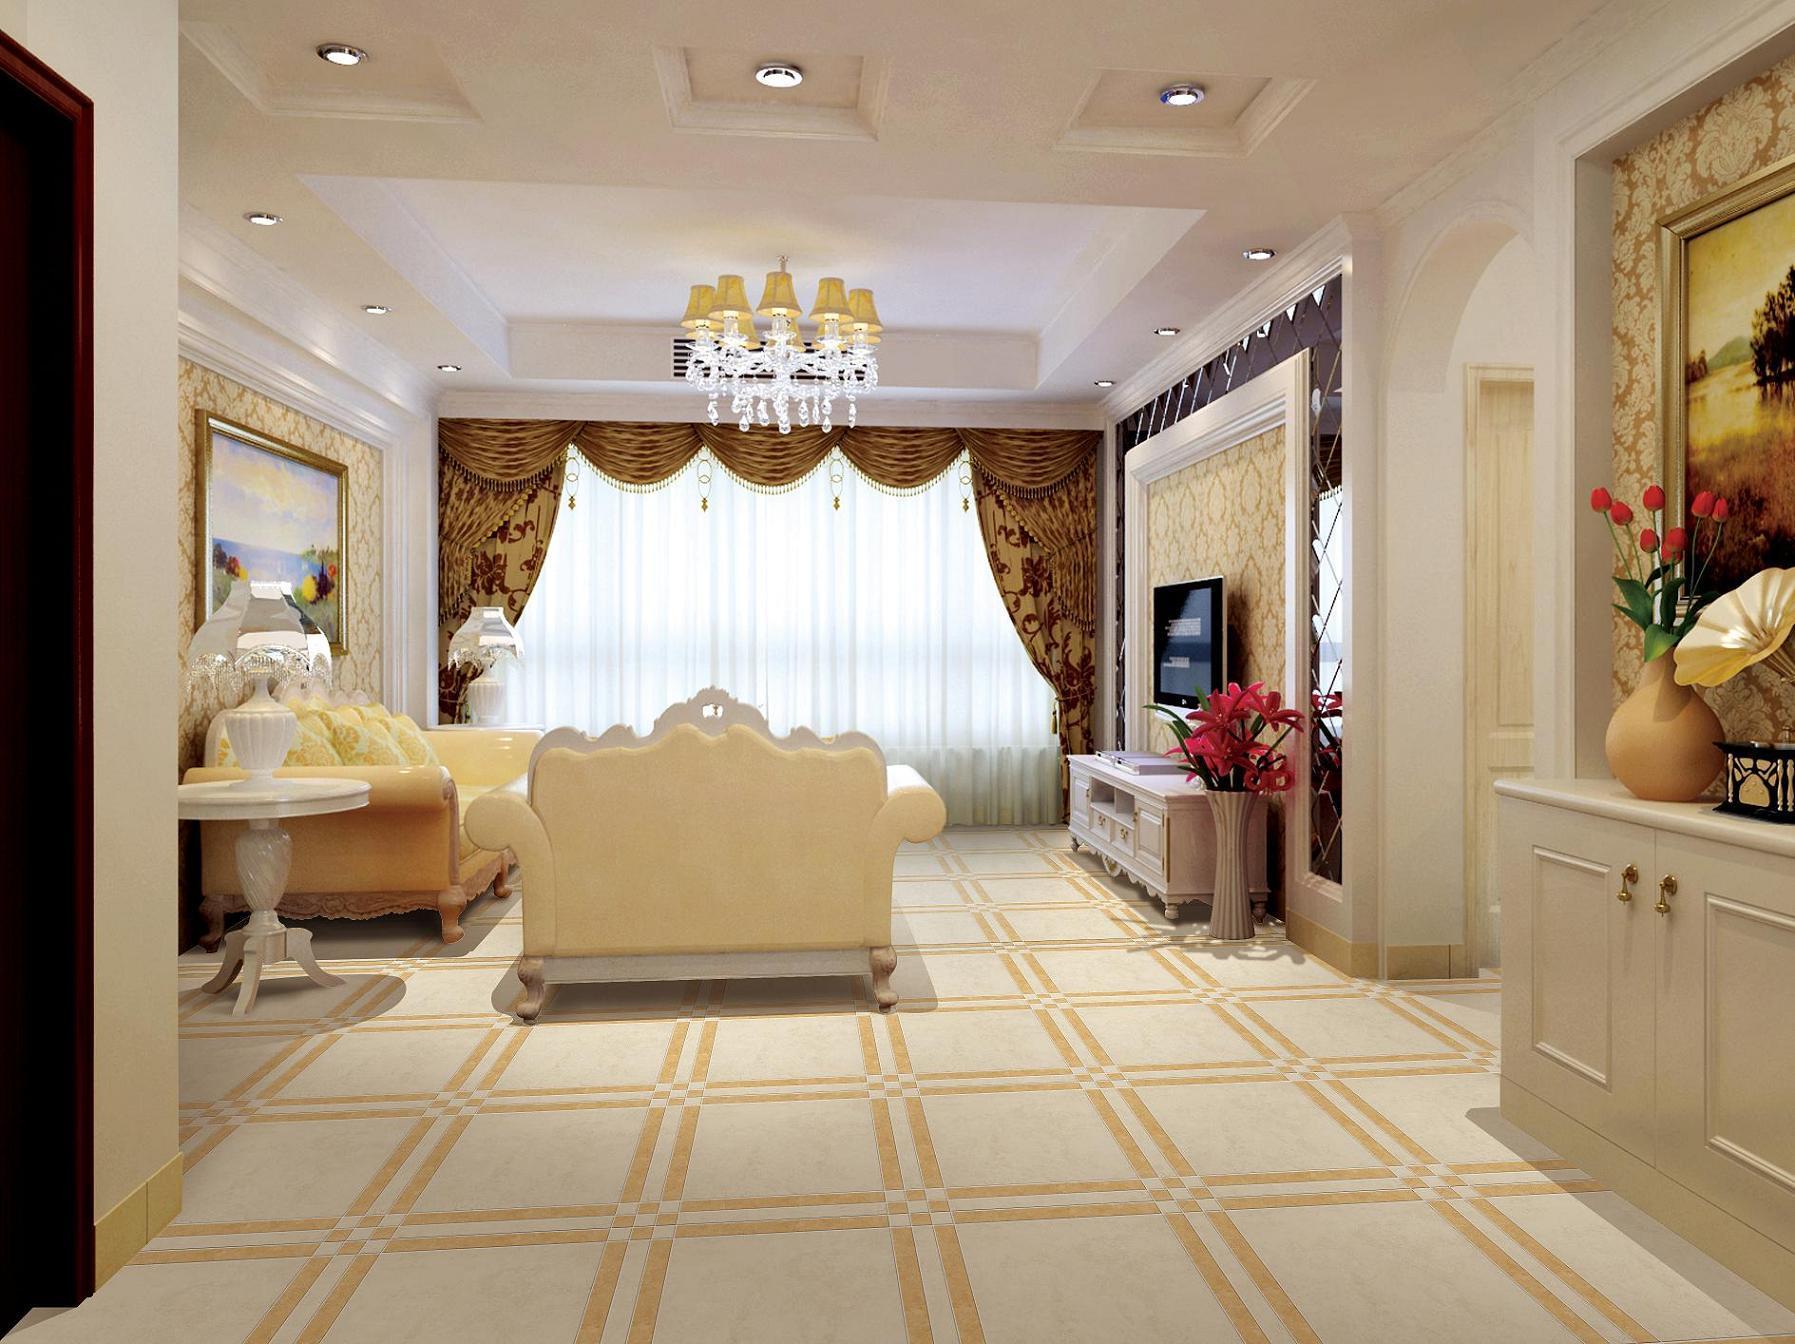 High Quality Building Material Porcelain Rustic Tile 50cm*50cm Anti-Slip Floor Tile Wall Tile Kitchen Tile Bath Room Tile Ath5501